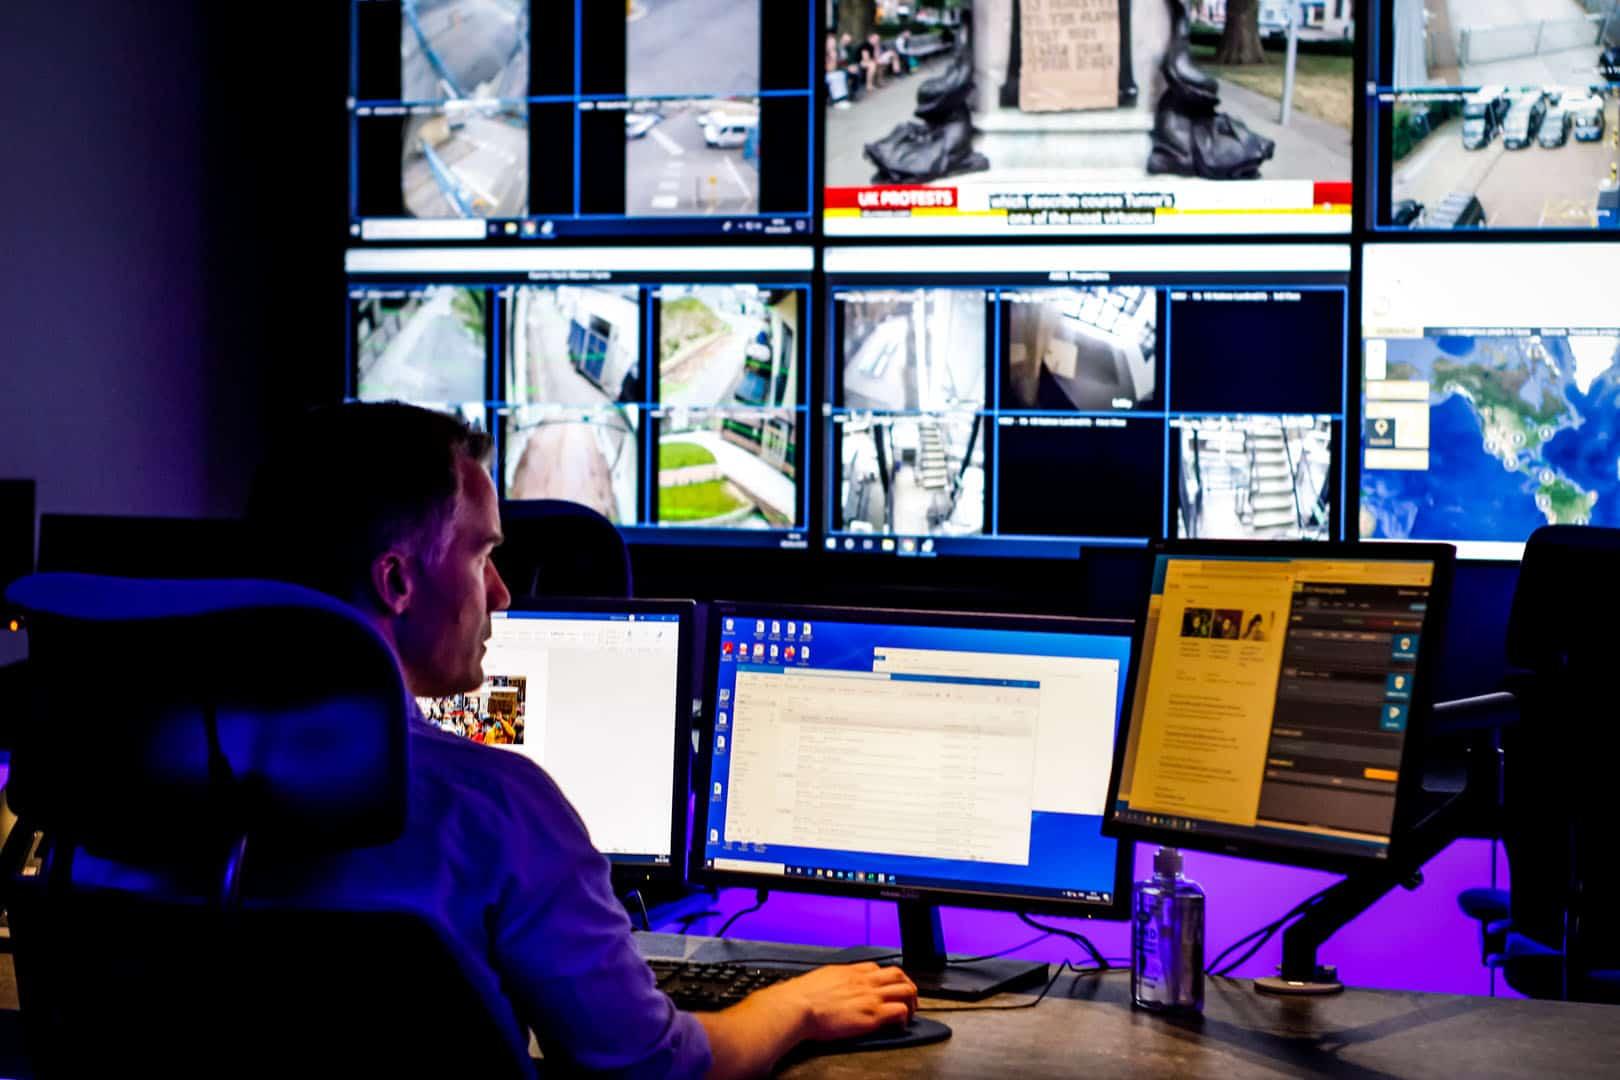 remote cctv monitoring control room image